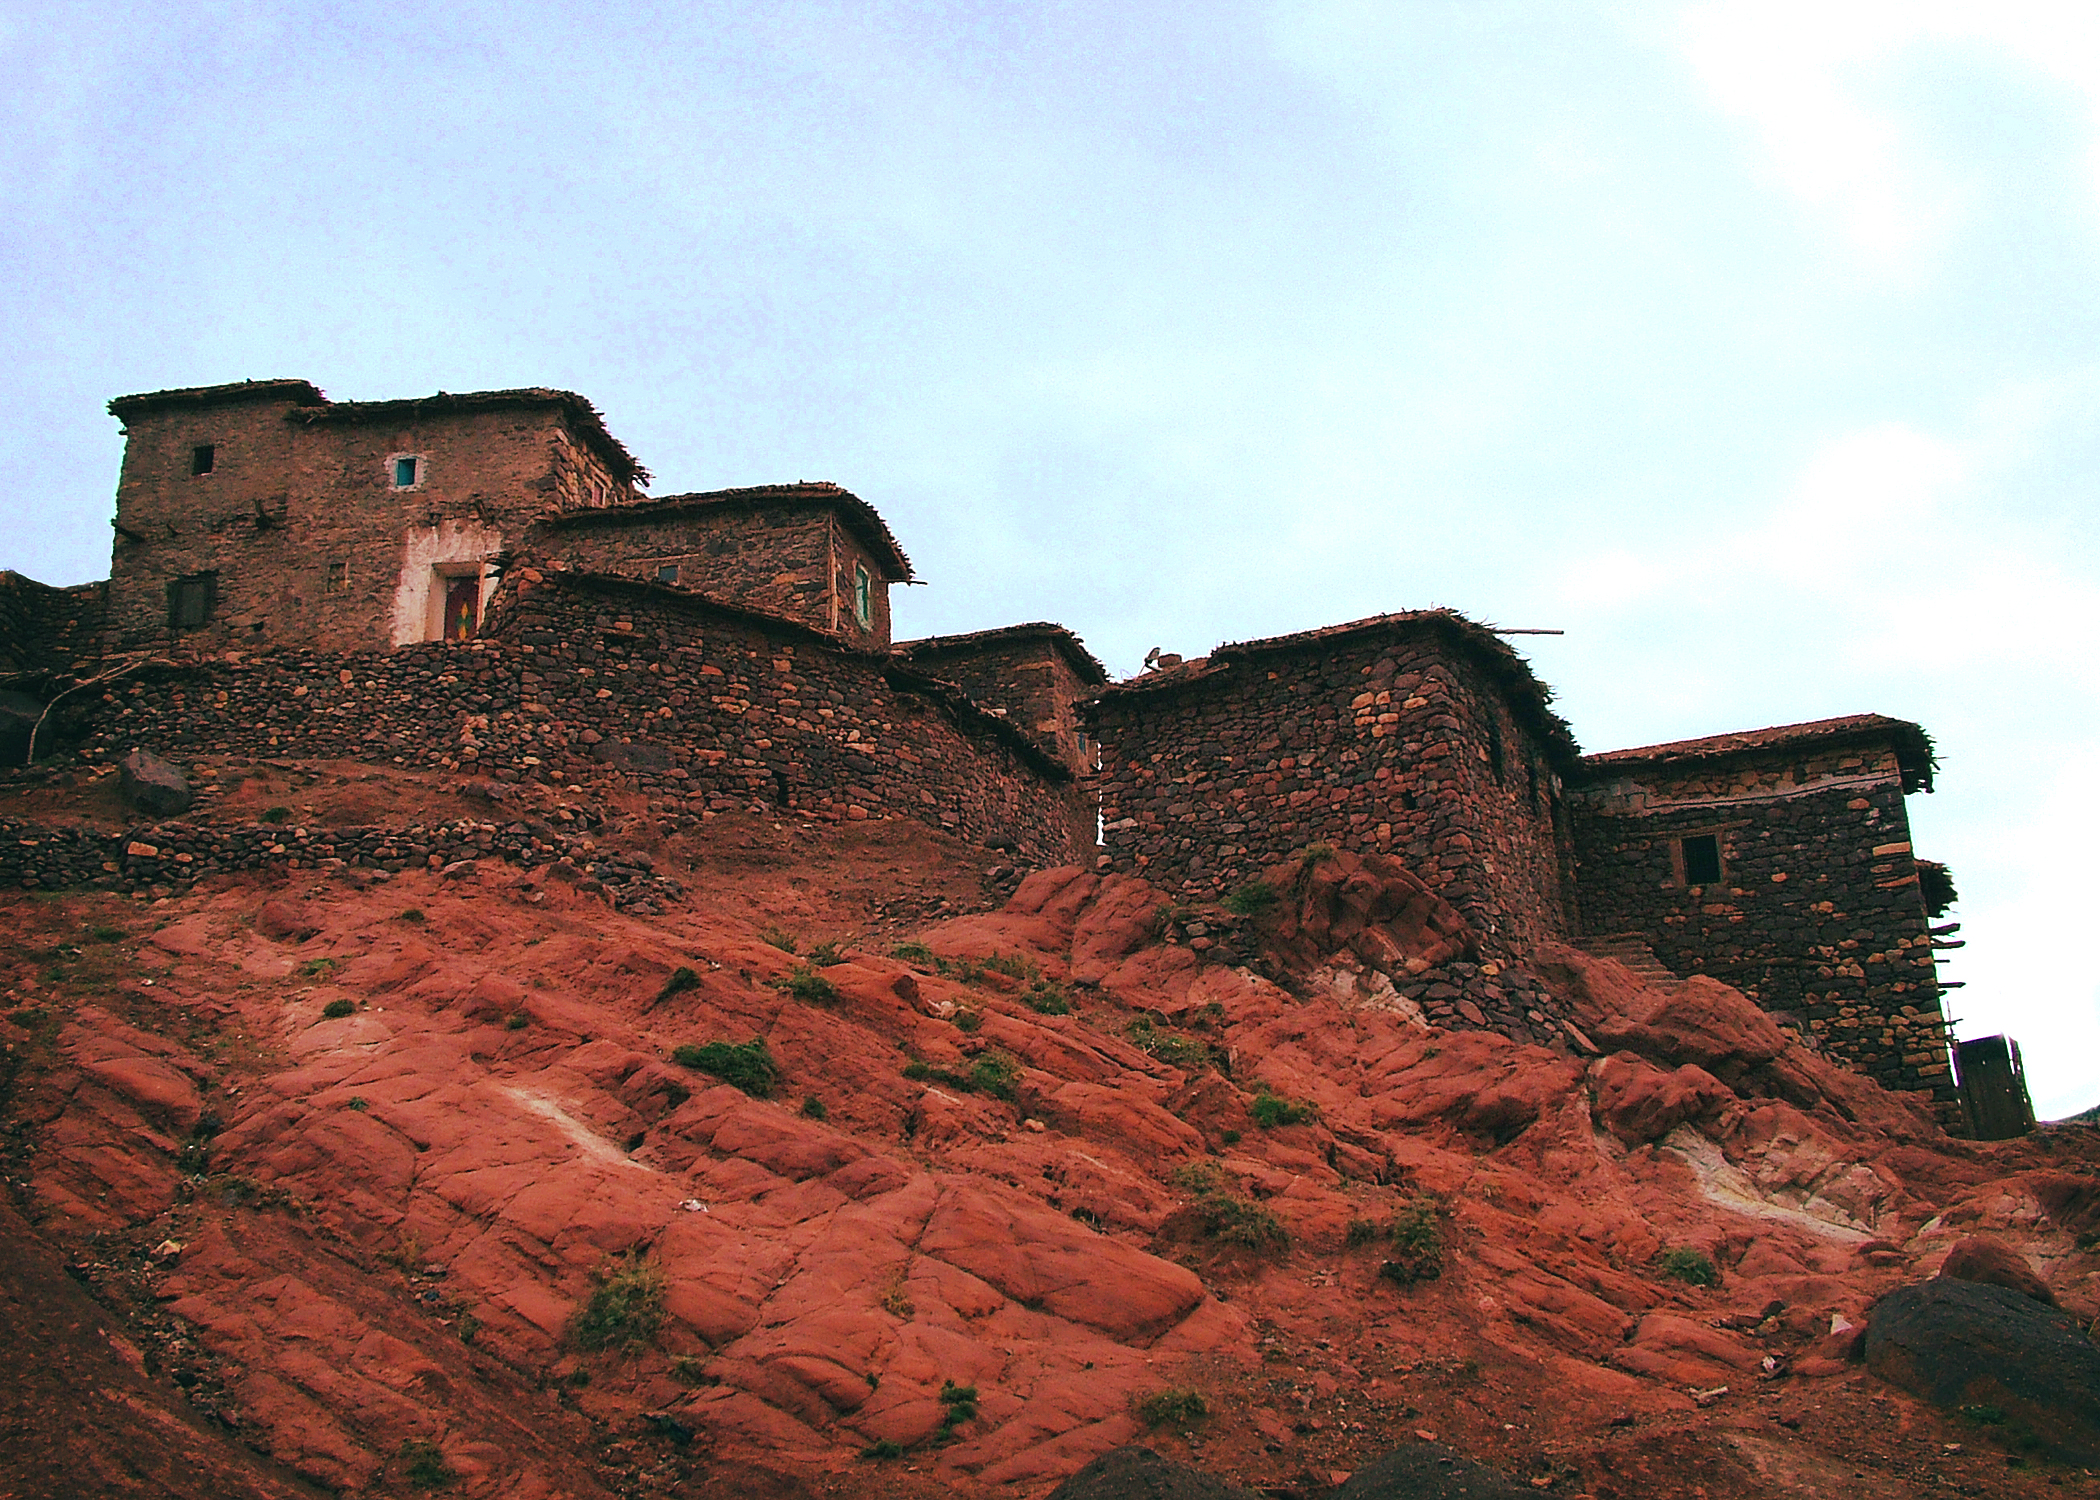 https://upload.wikimedia.org/wikipedia/commons/6/68/Village_berber.jpg